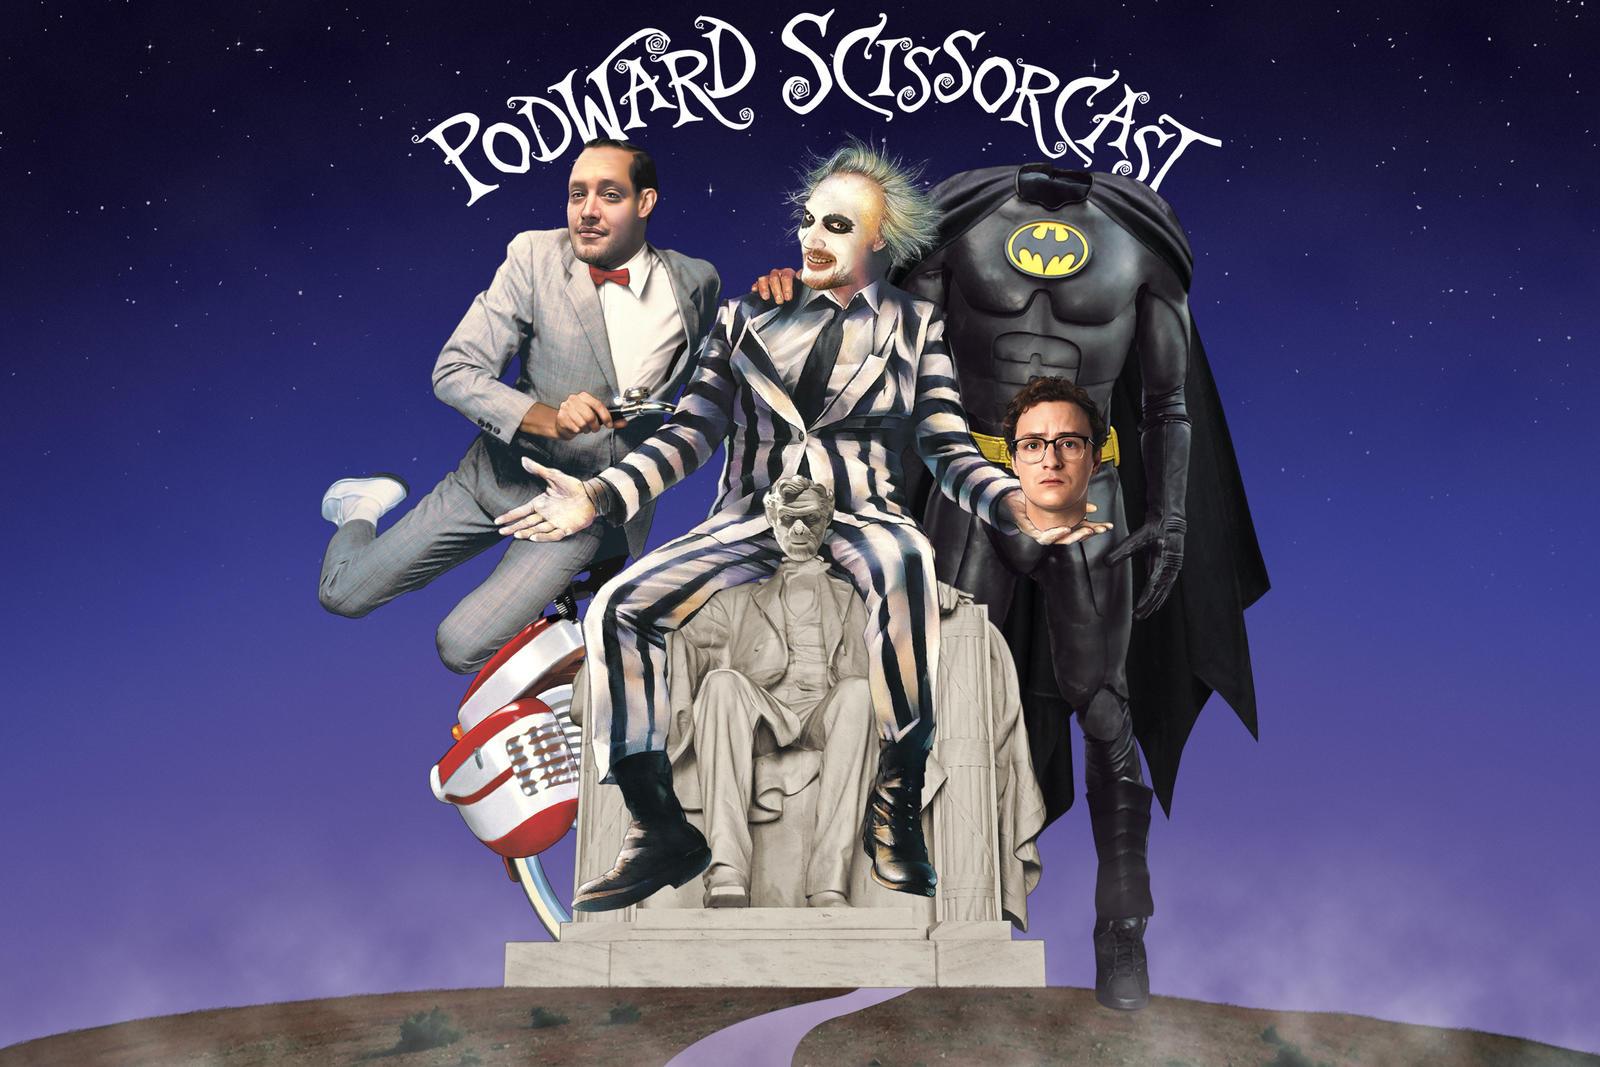 Podward-Scissorcast-hires.jpg